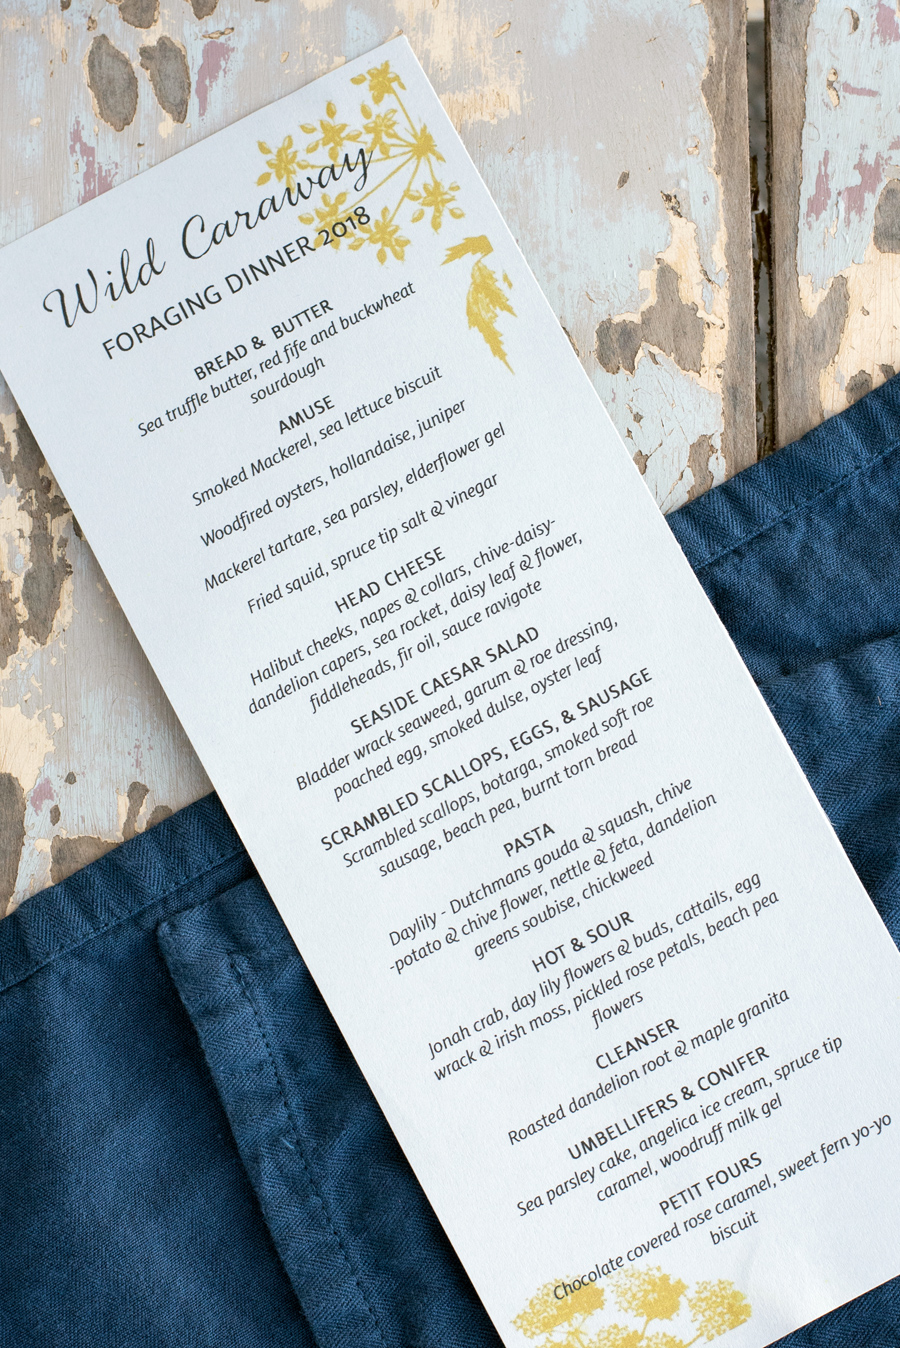 Wild-Caraway-Restaurant-Michelle-Doucette-18.jpg